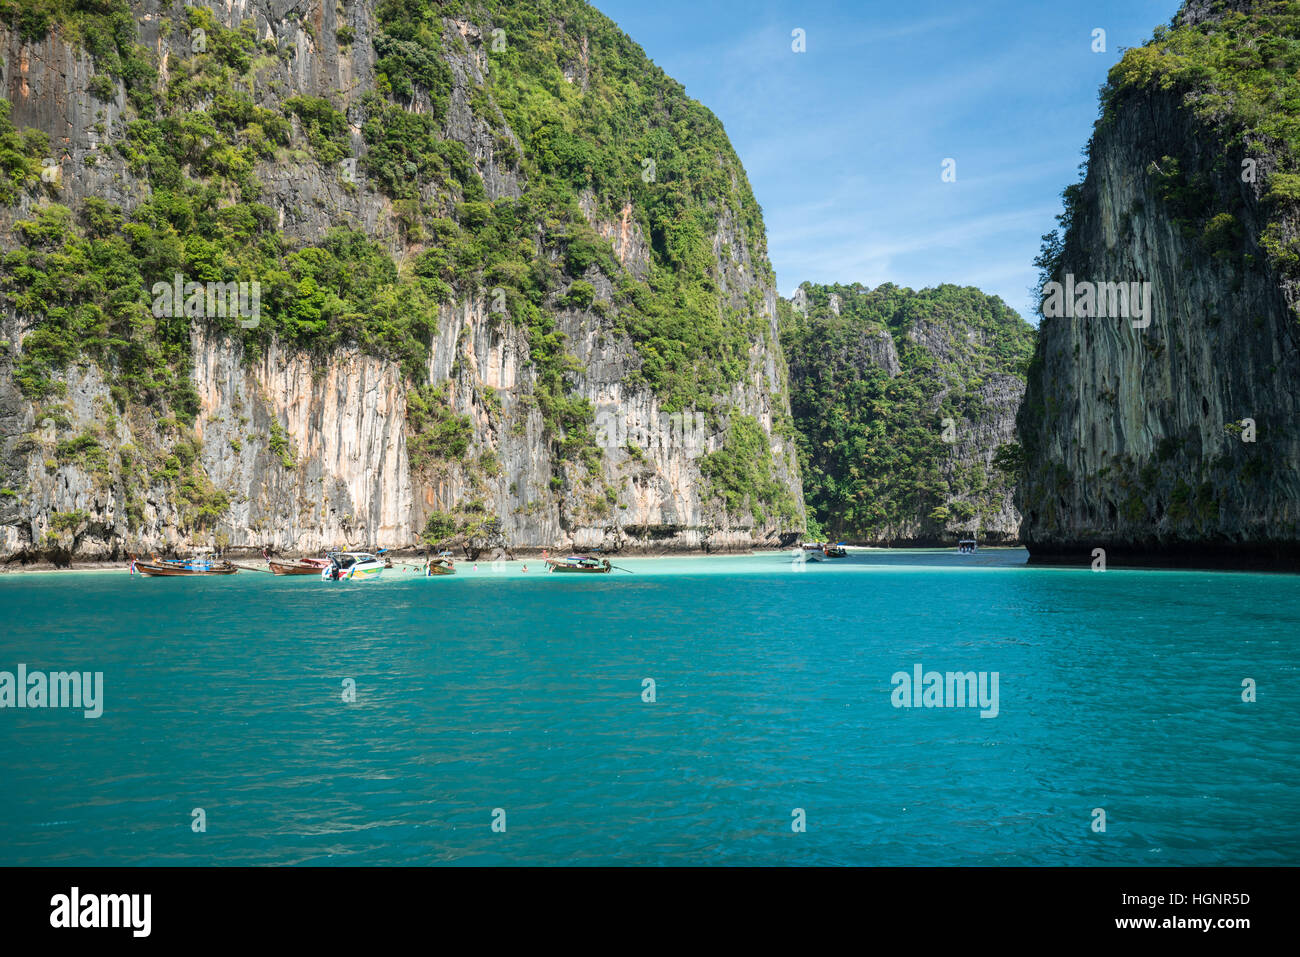 Jungle limestone cliffs around Phi-Phi Leh island with tourist boat parking - Stock Image